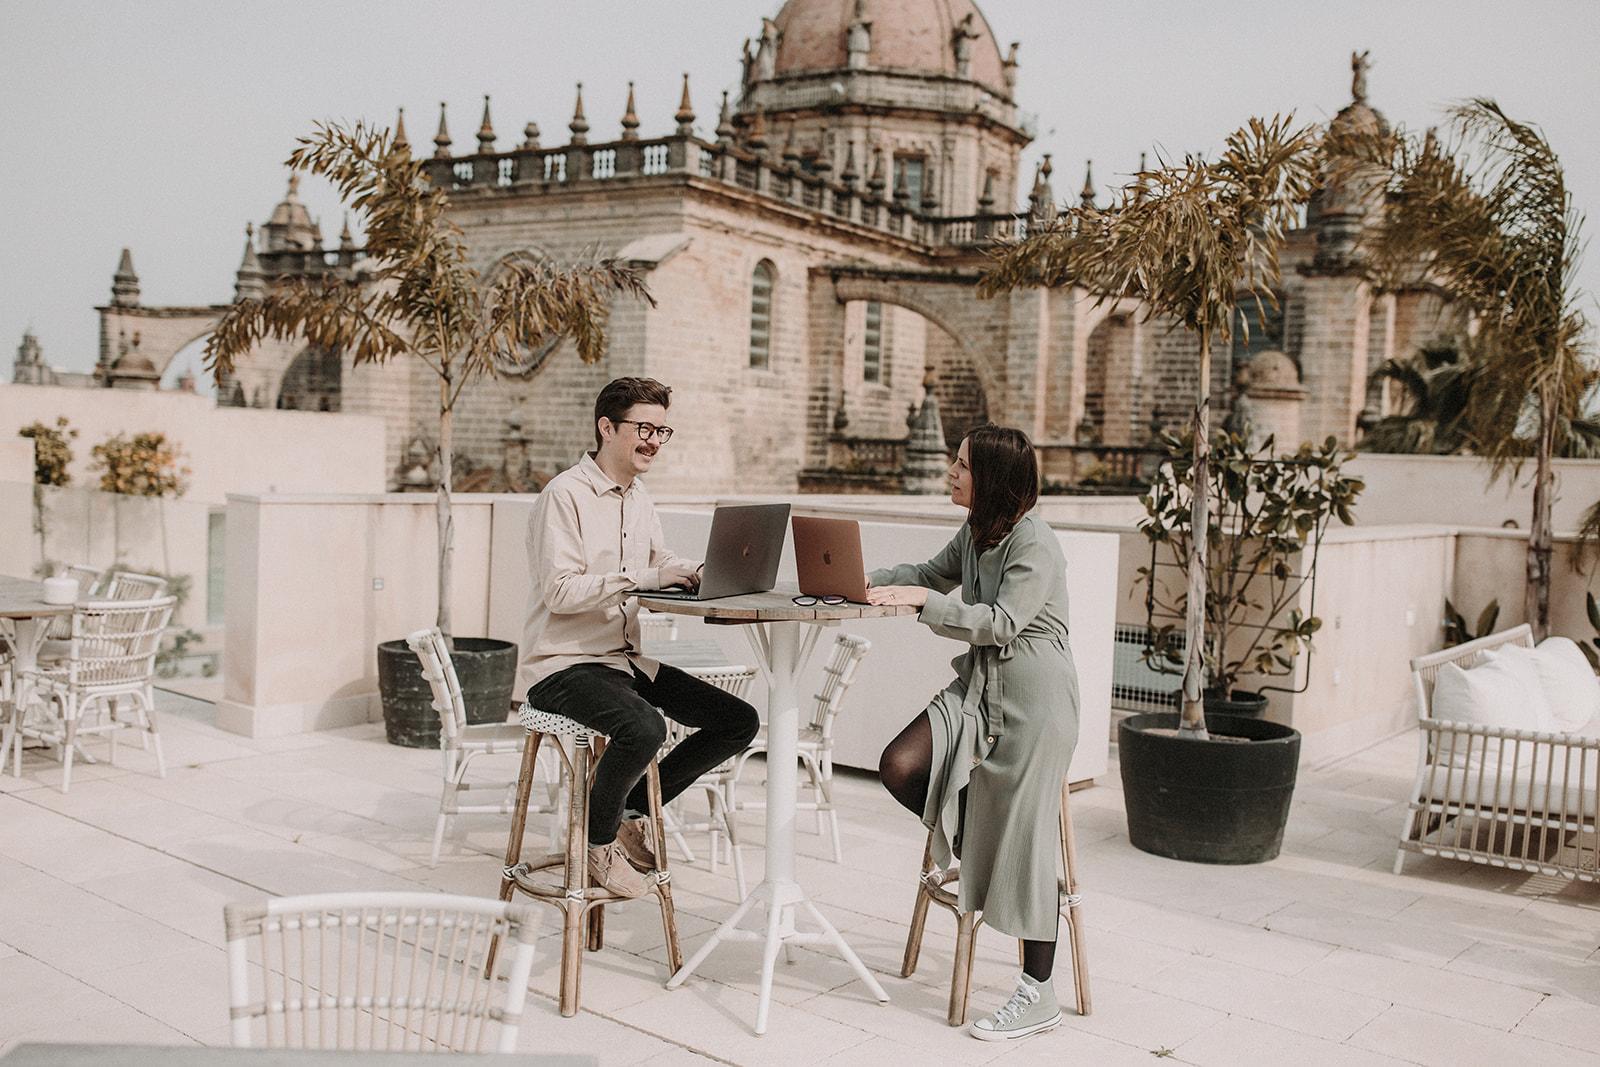 Oheme Bodas - ¿Cómo se organiza una boda?